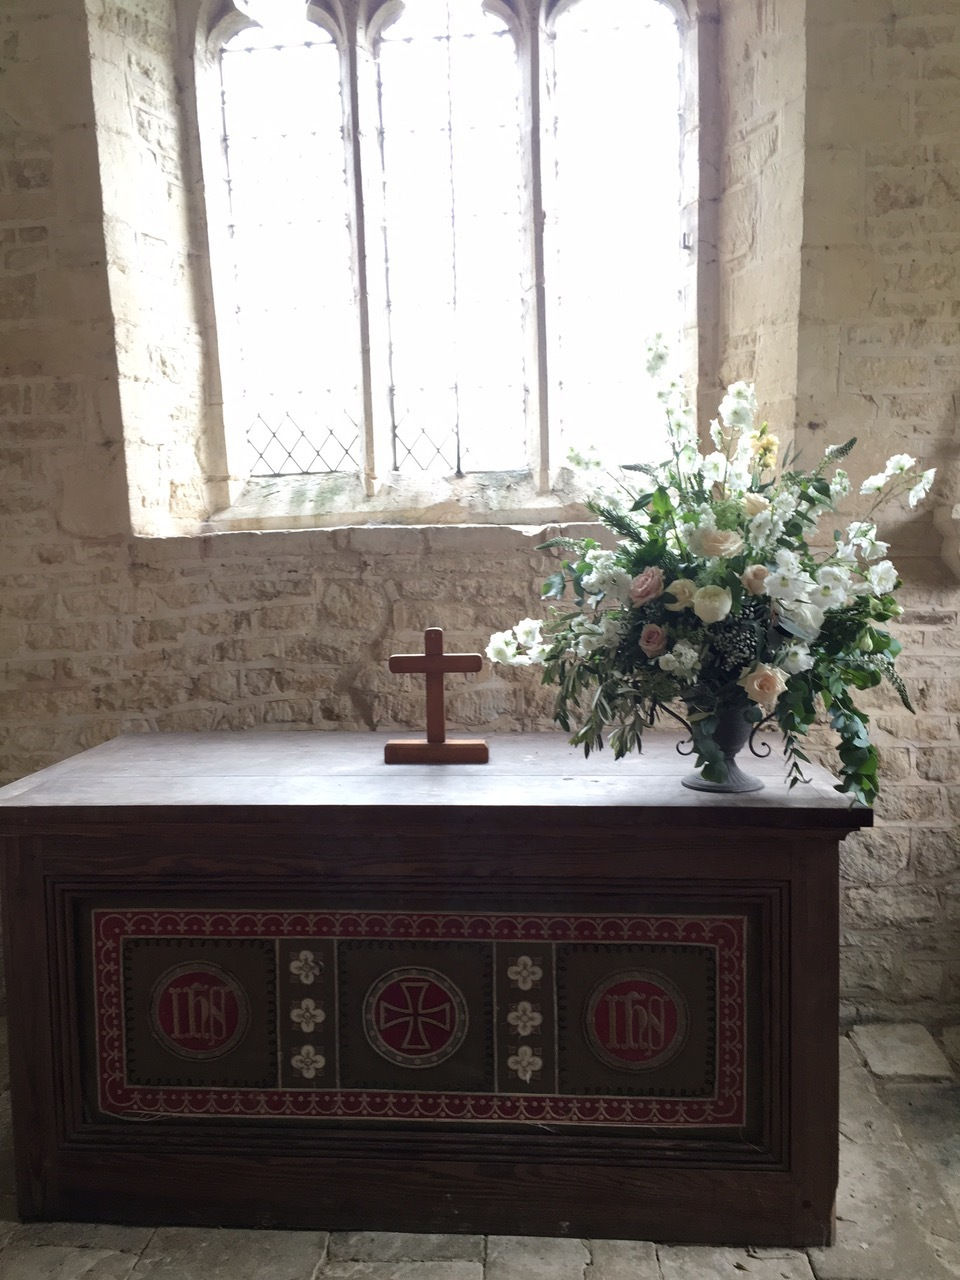 church alter display.JPG